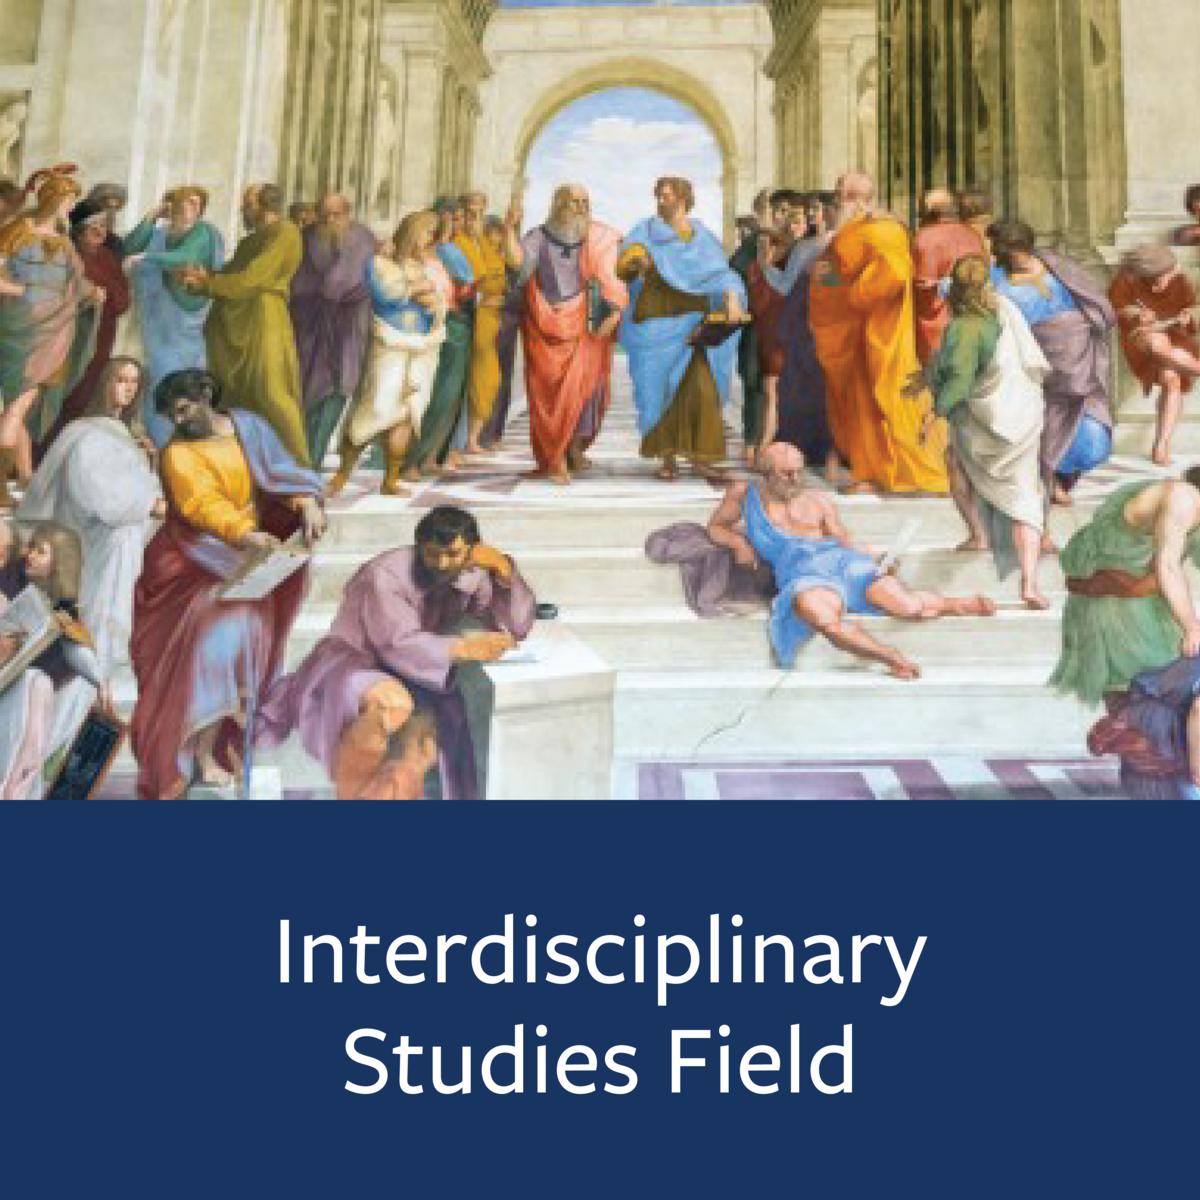 Interdisciplinary Studies Field